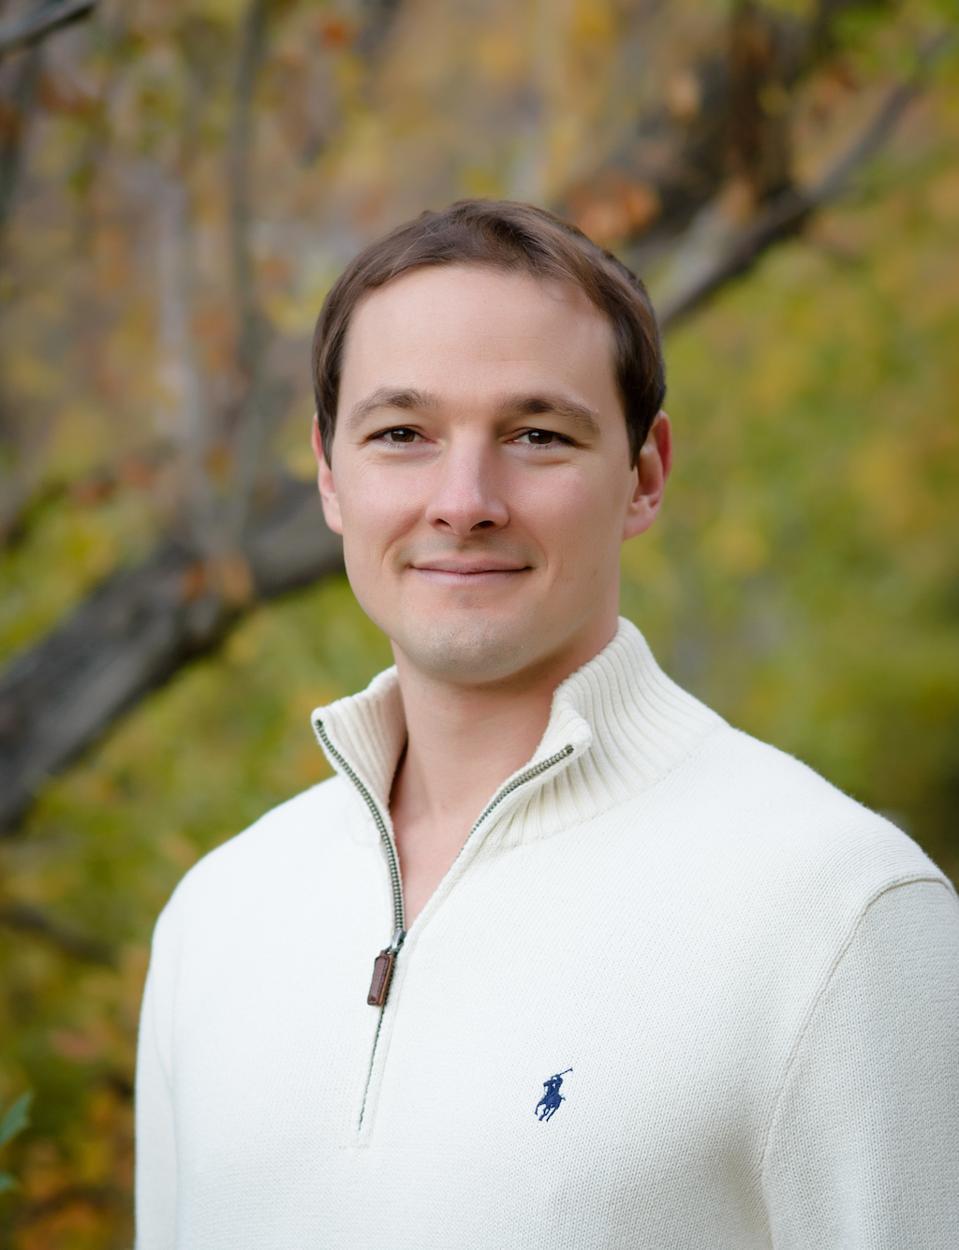 Portrait of a man wearing white Ralph Lauren Polo sweater